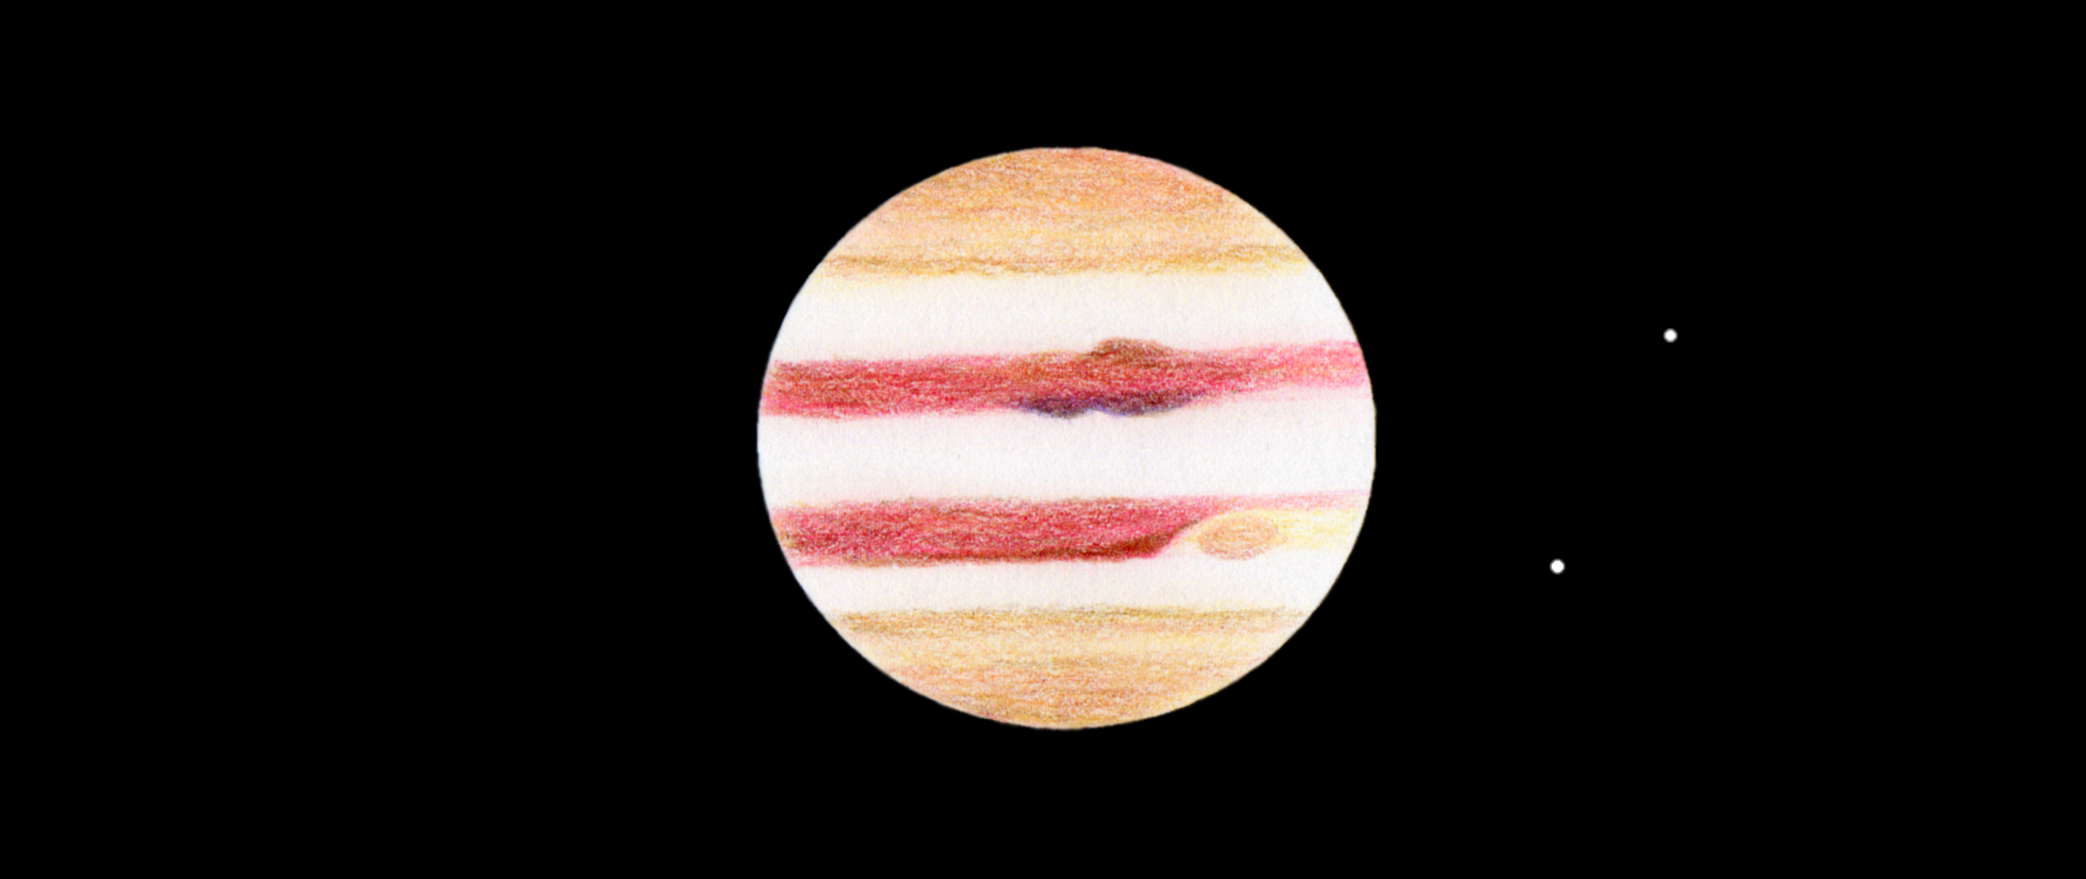 http://ekladata.com/XT8UZ4hnkYINhAZ70uIvXefK1vU/Jupiter-21-02-2016-T150-1h30.png